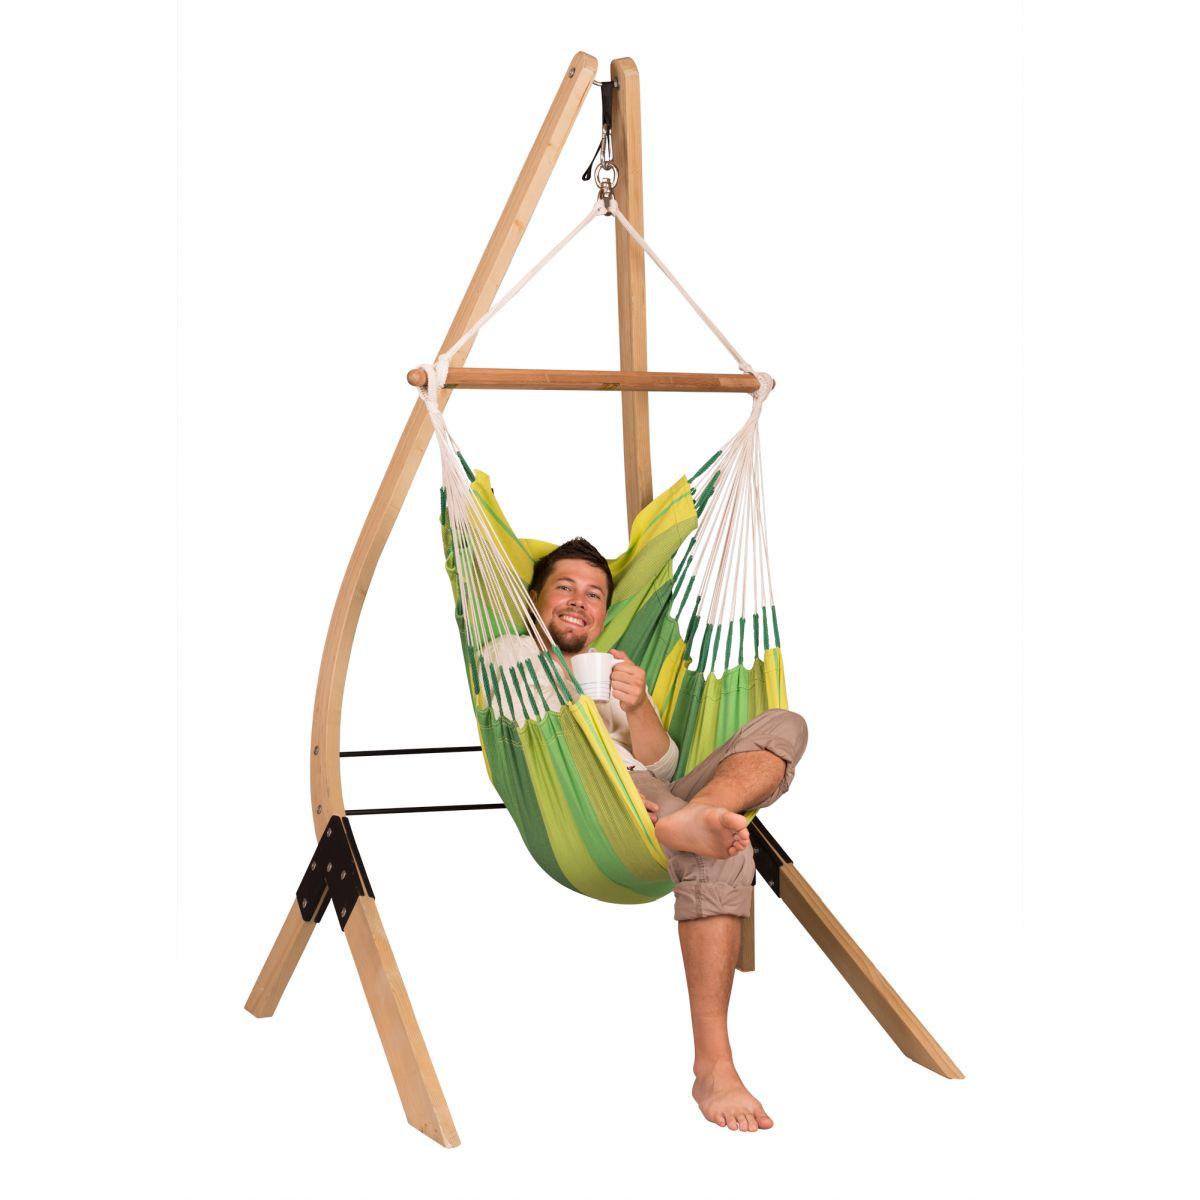 la siesta chaise hamac basic orquidea jungle support en bois vela